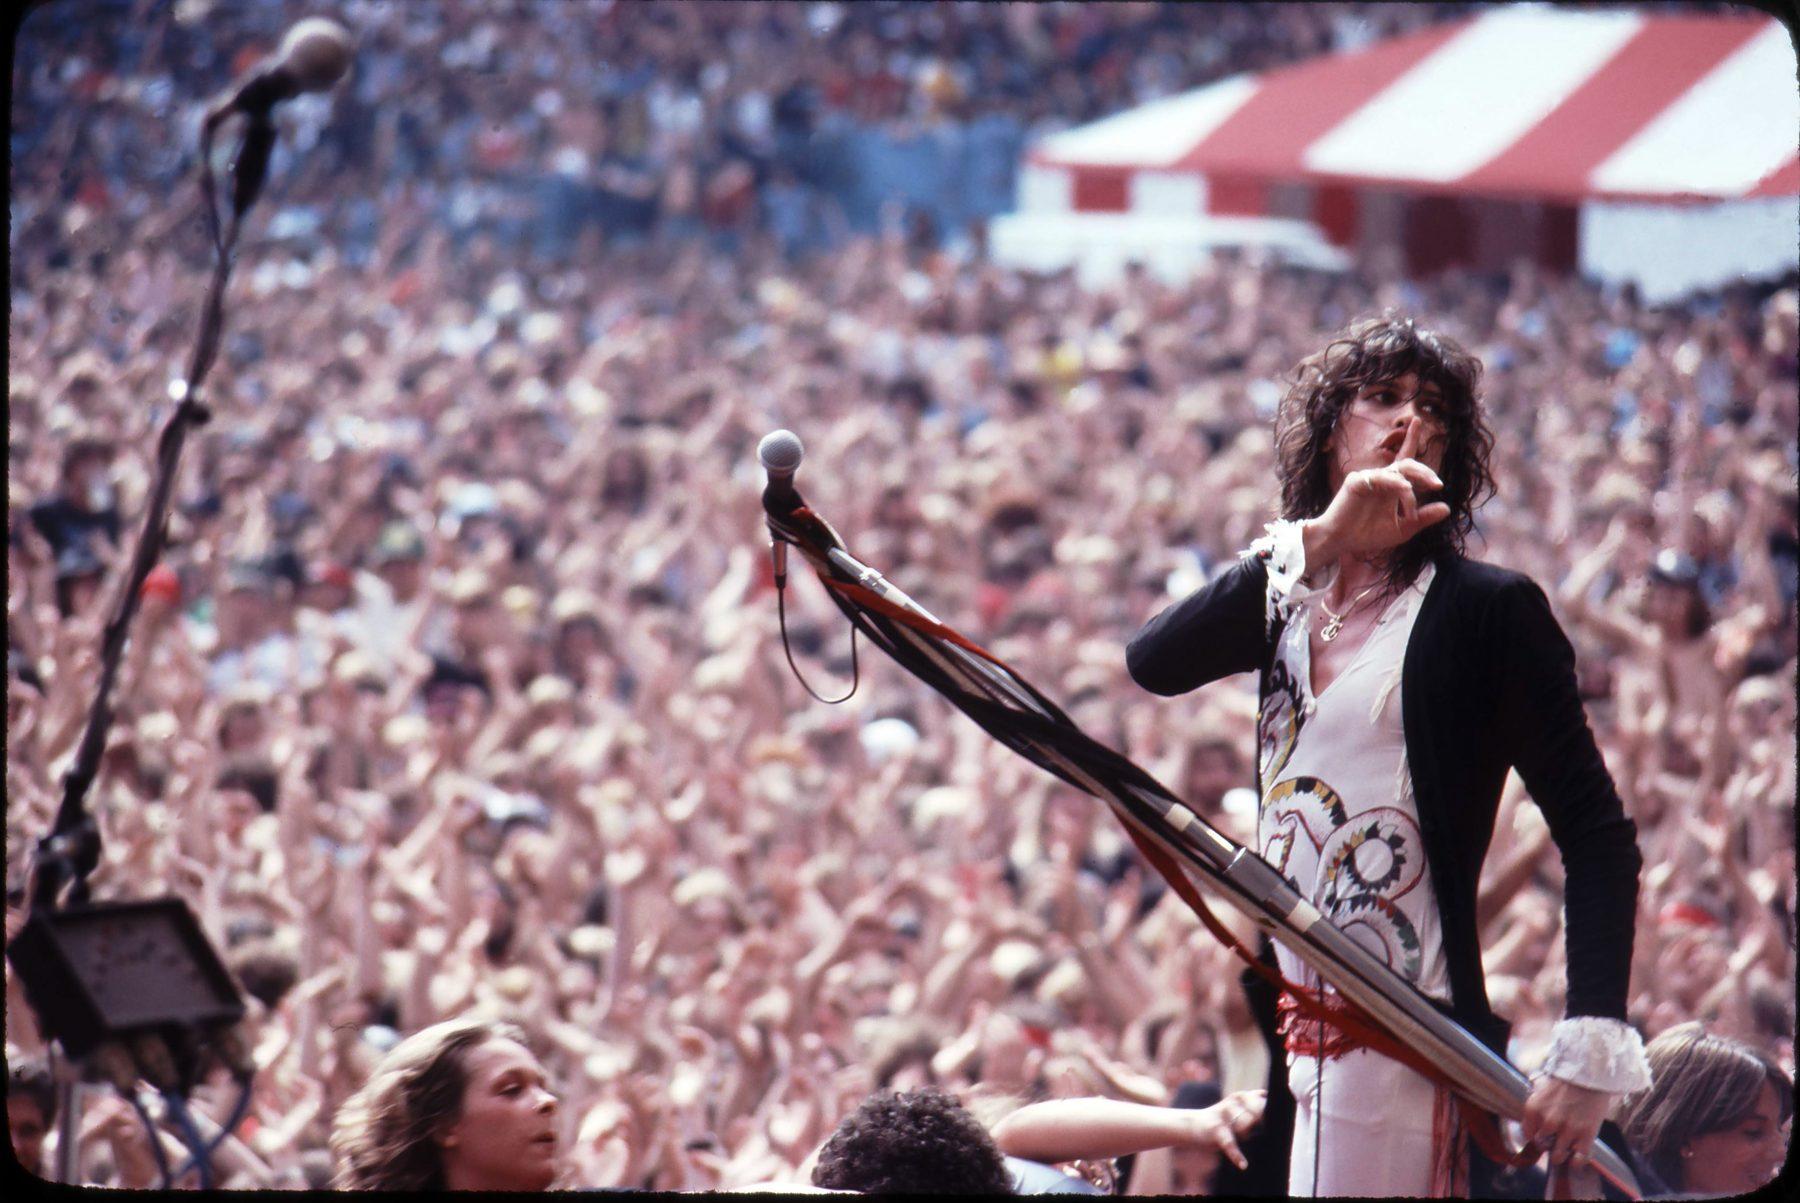 Aerosmith, 1979, Michael N. MarksPhoto Credit: Michael N. Marks